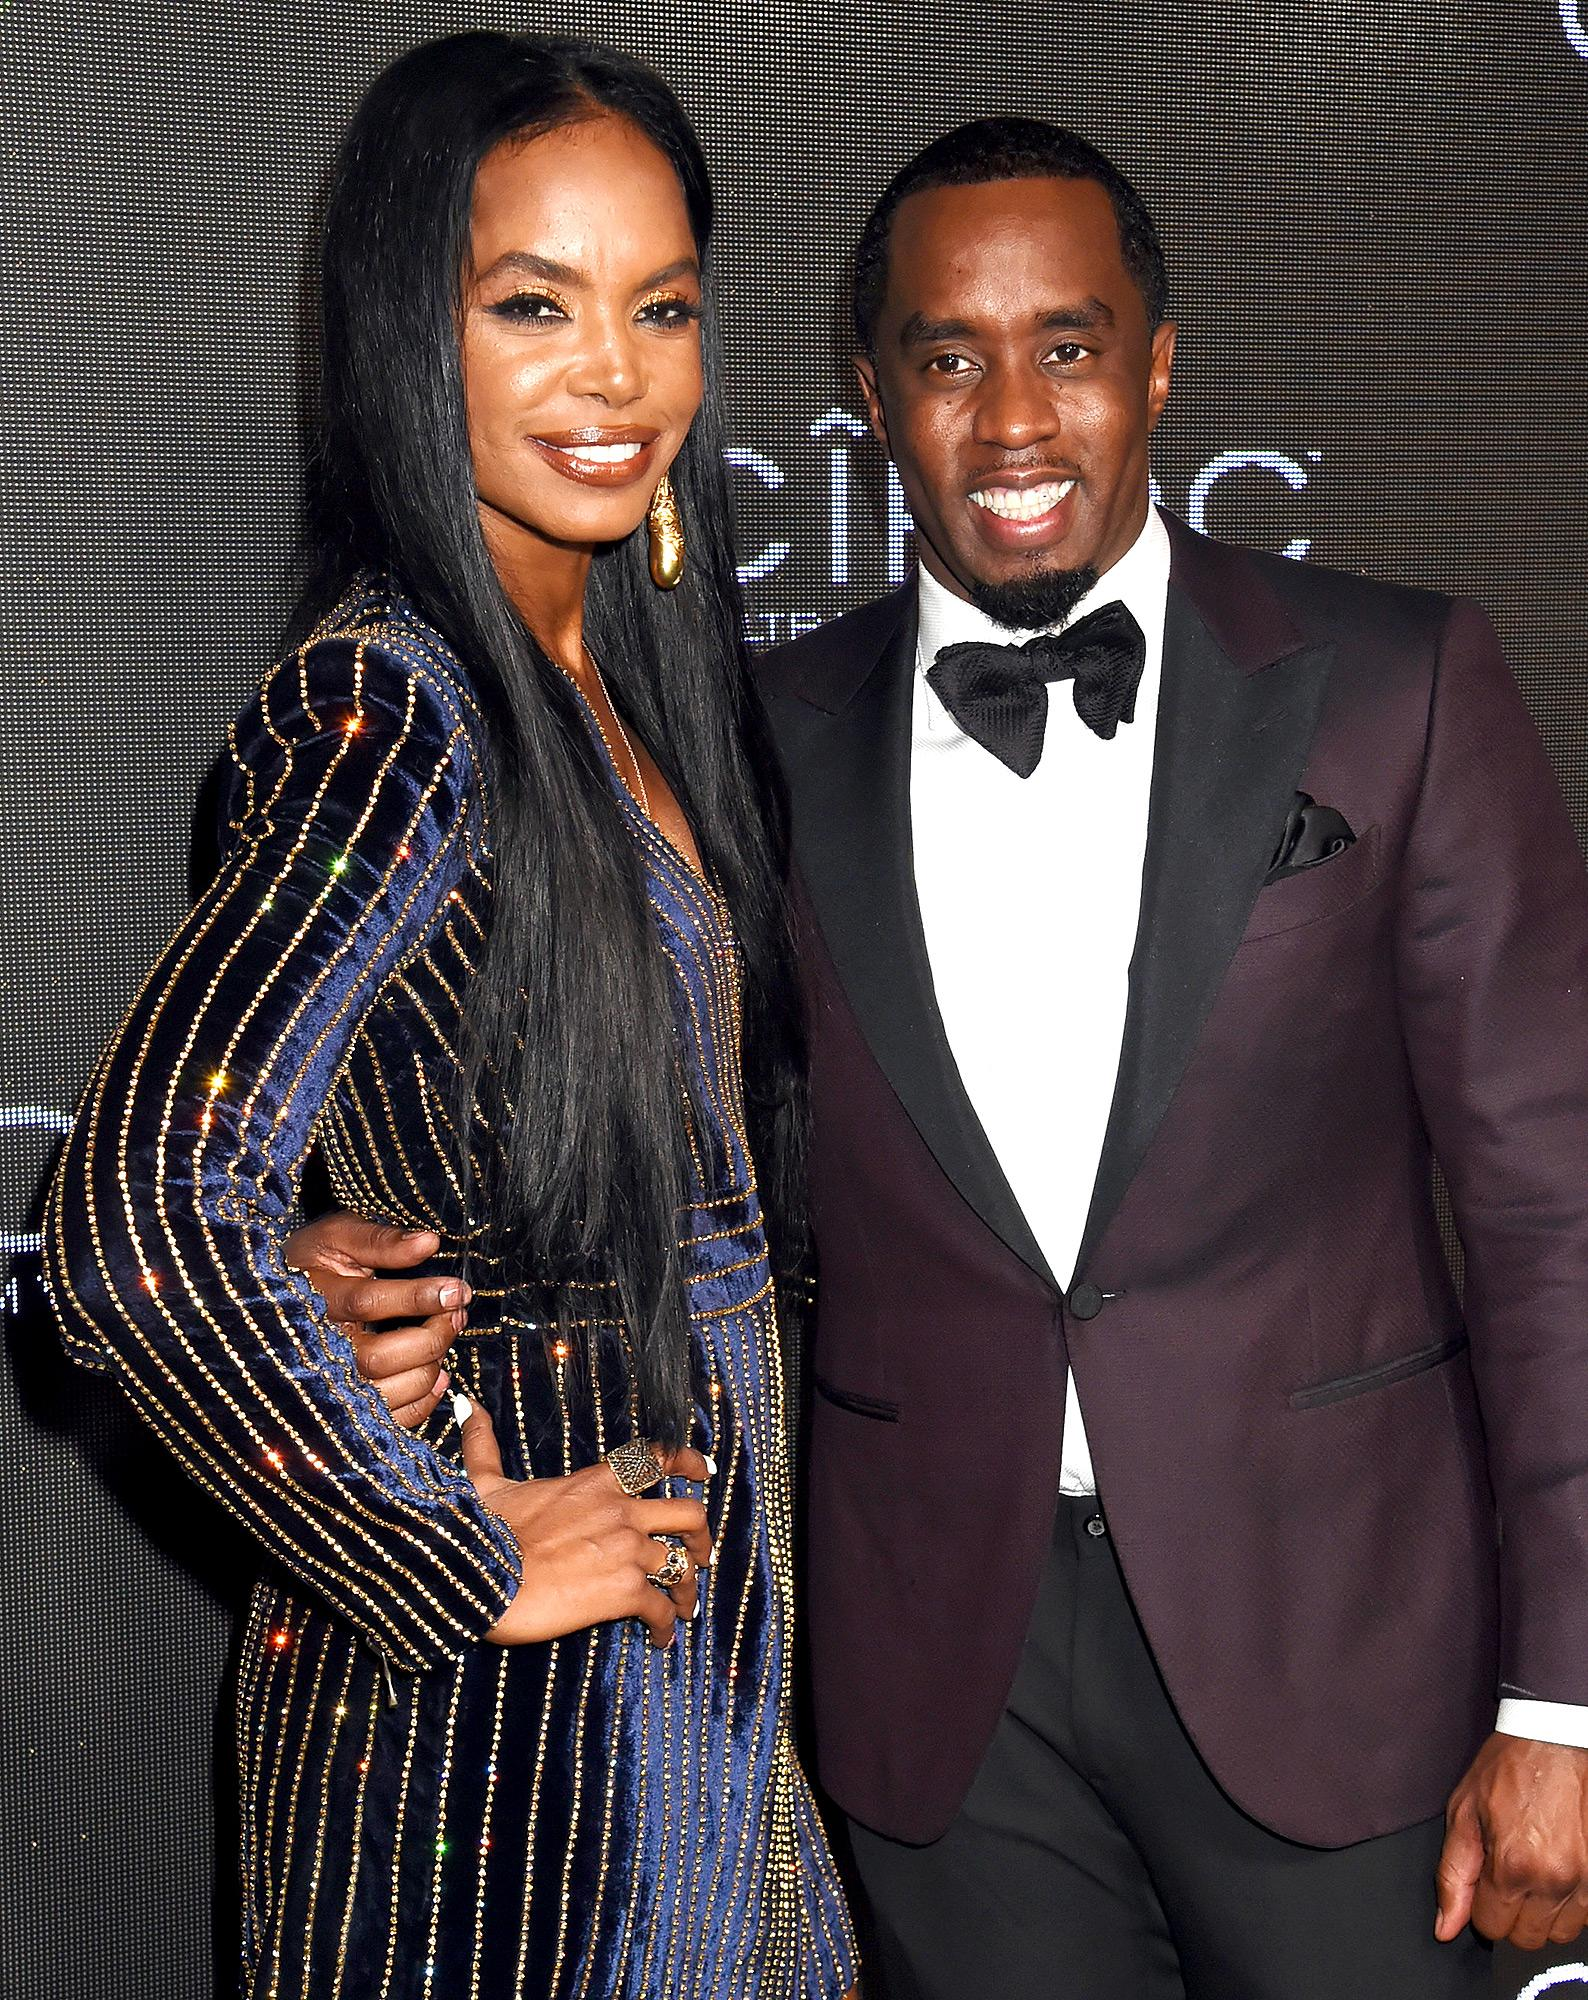 Sean Diddy Combs Ex-Girlfriend Kim Porter Found Dead at